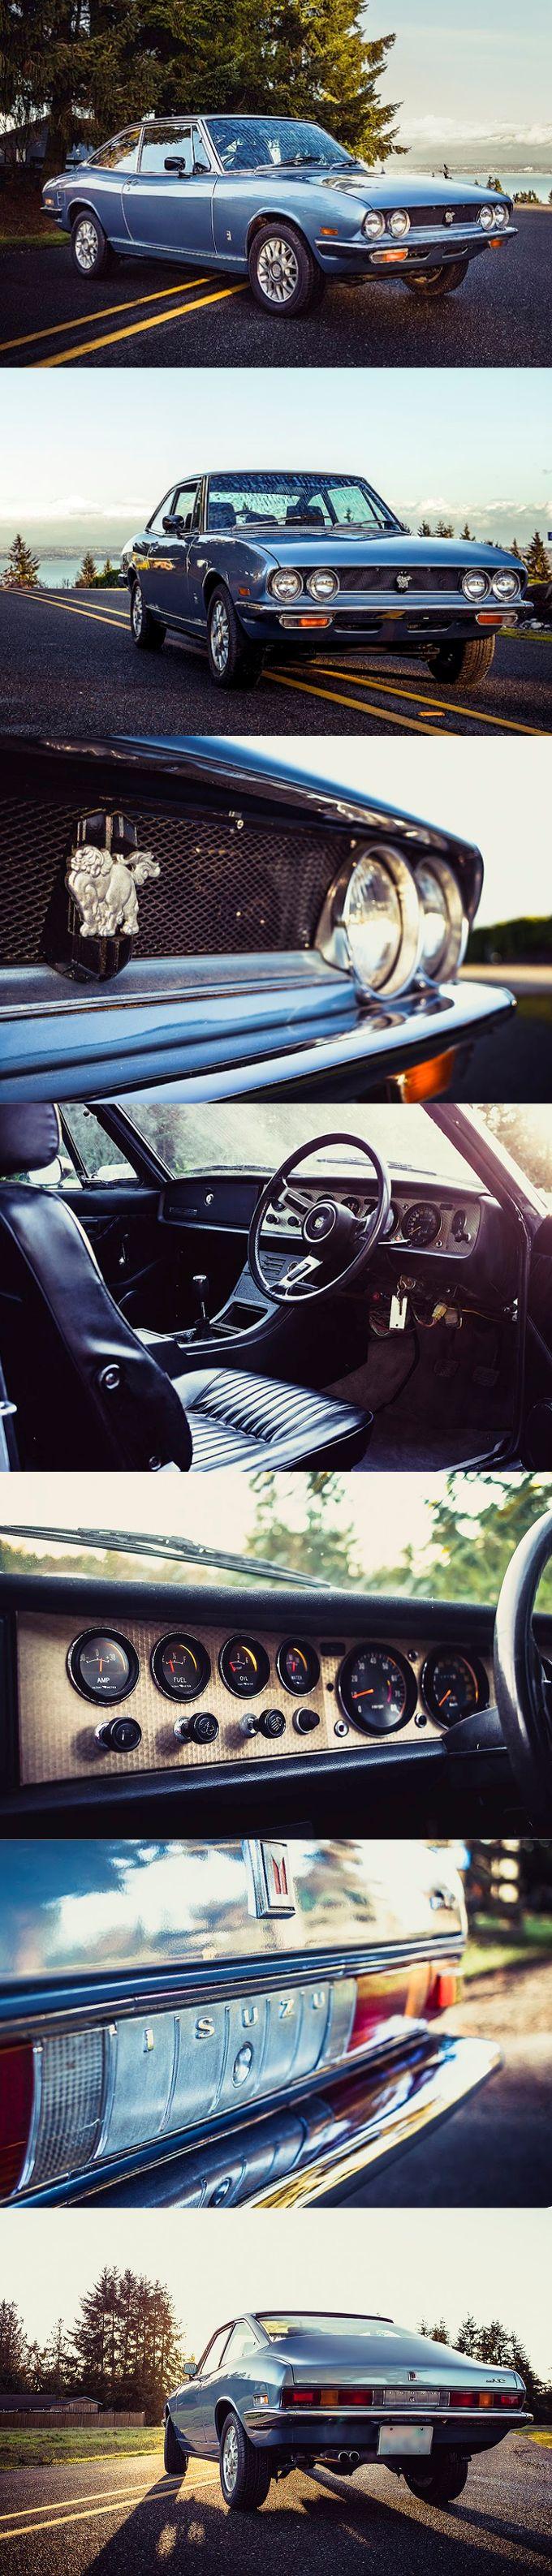 1975 Isuzu 117 GT XC / Giorgetto Giugiaro / 115hp1.5l L4 / Japan / blue / Bringatrailer